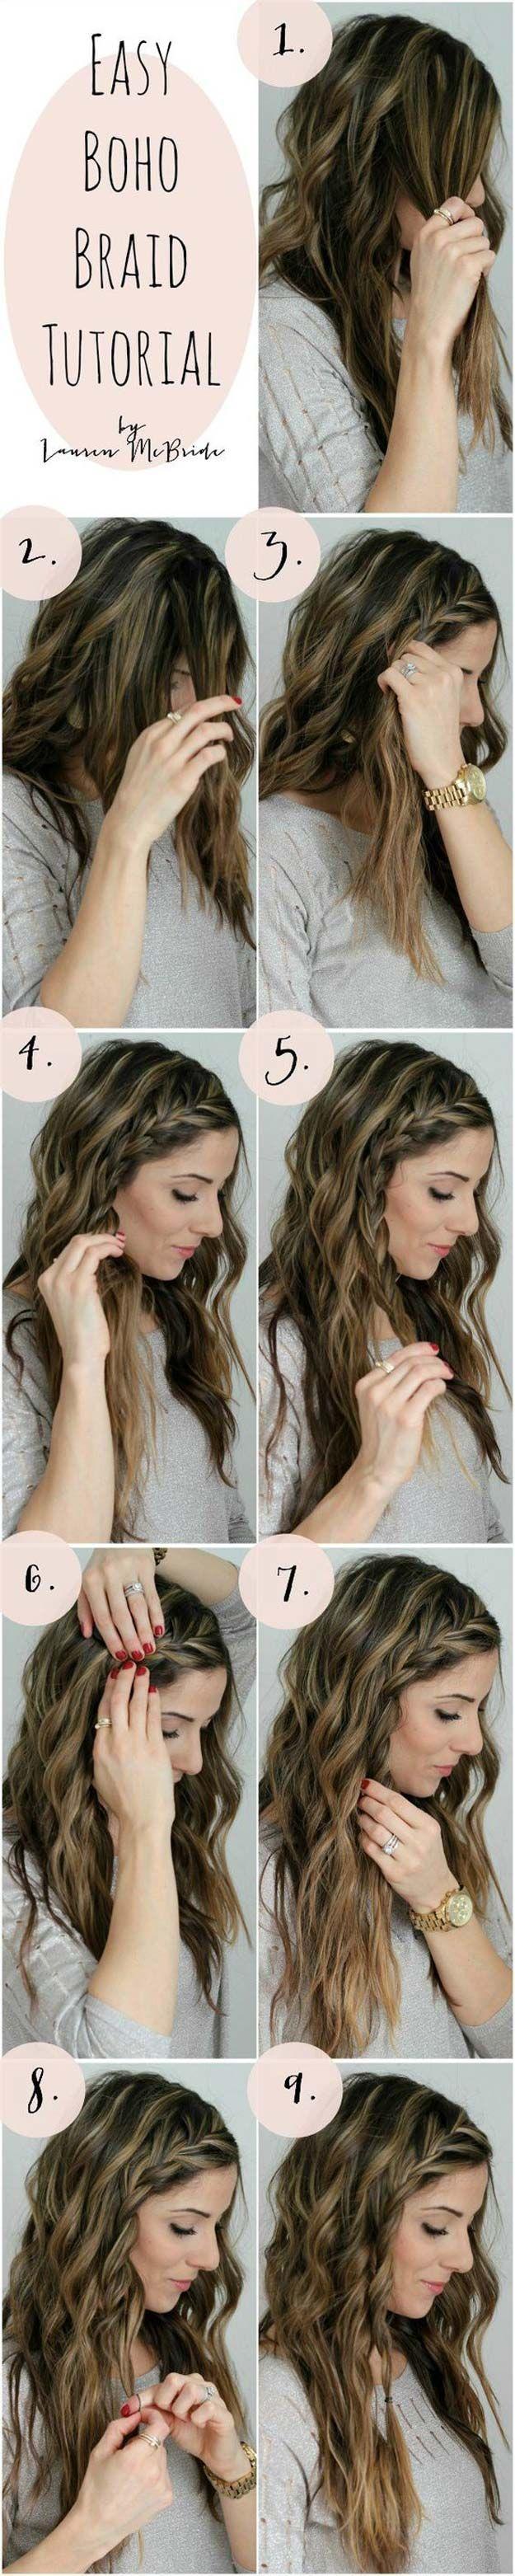 Best Hair Braiding Tutorials - Easy Boho Braid Tutorial - Easy Step by Step Tuto...